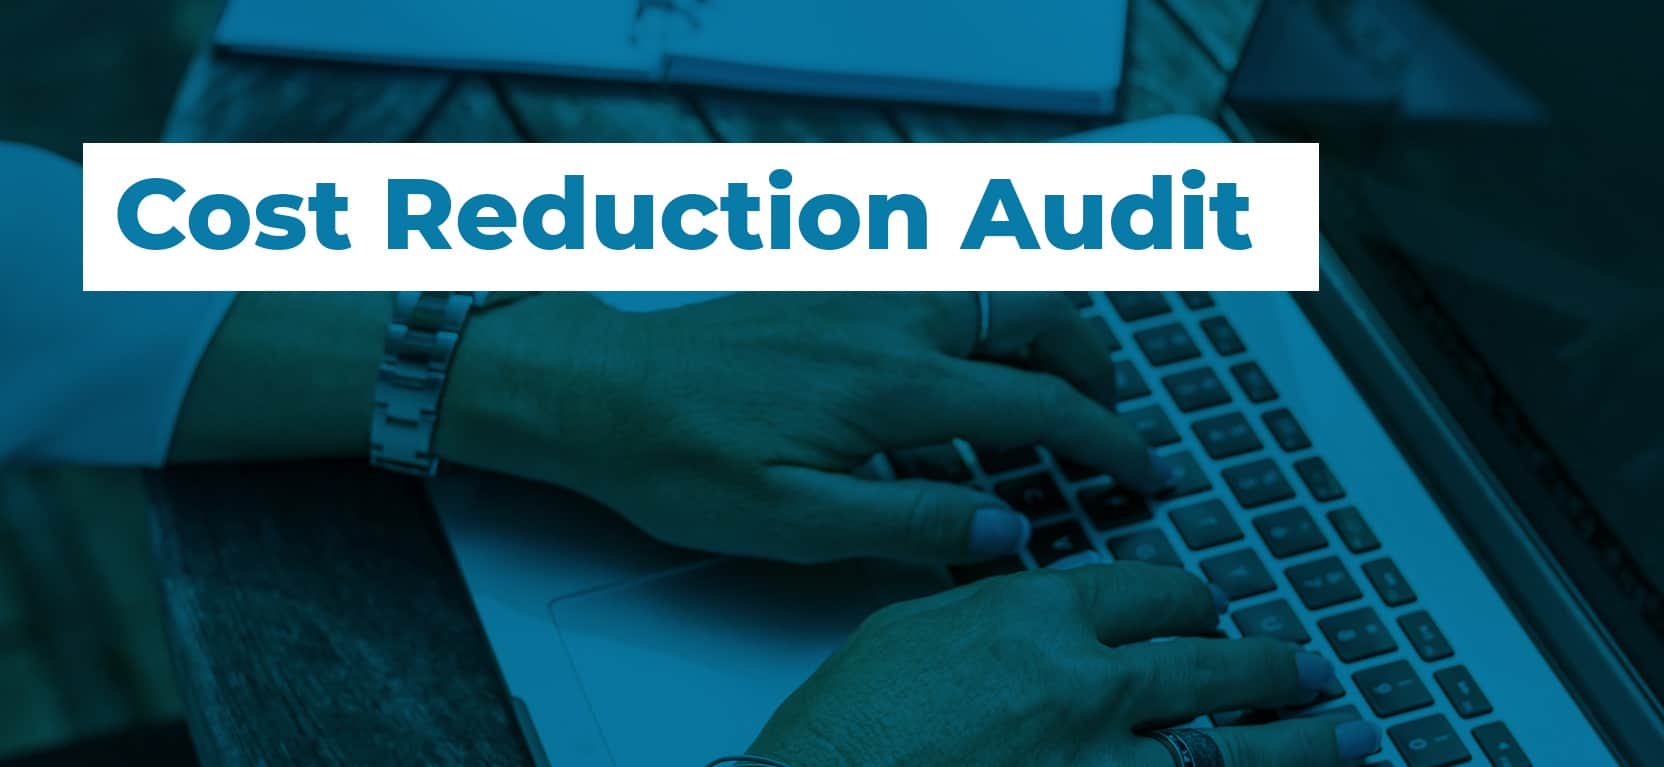 41 Cost Reduction Audit3